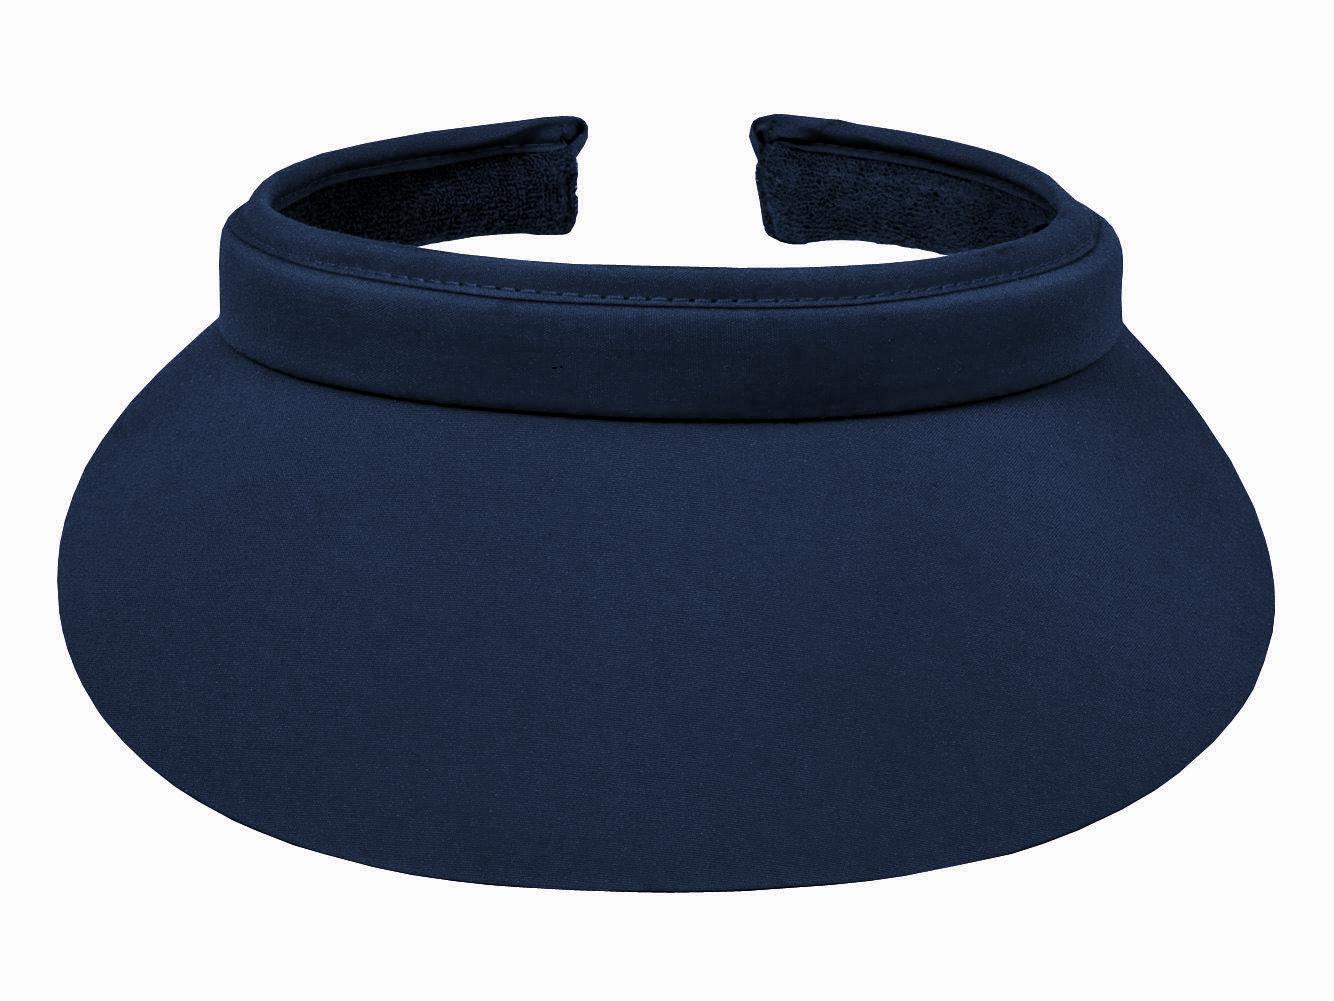 TopHeadwear-Nylon-Clip-On-Visor thumbnail 7